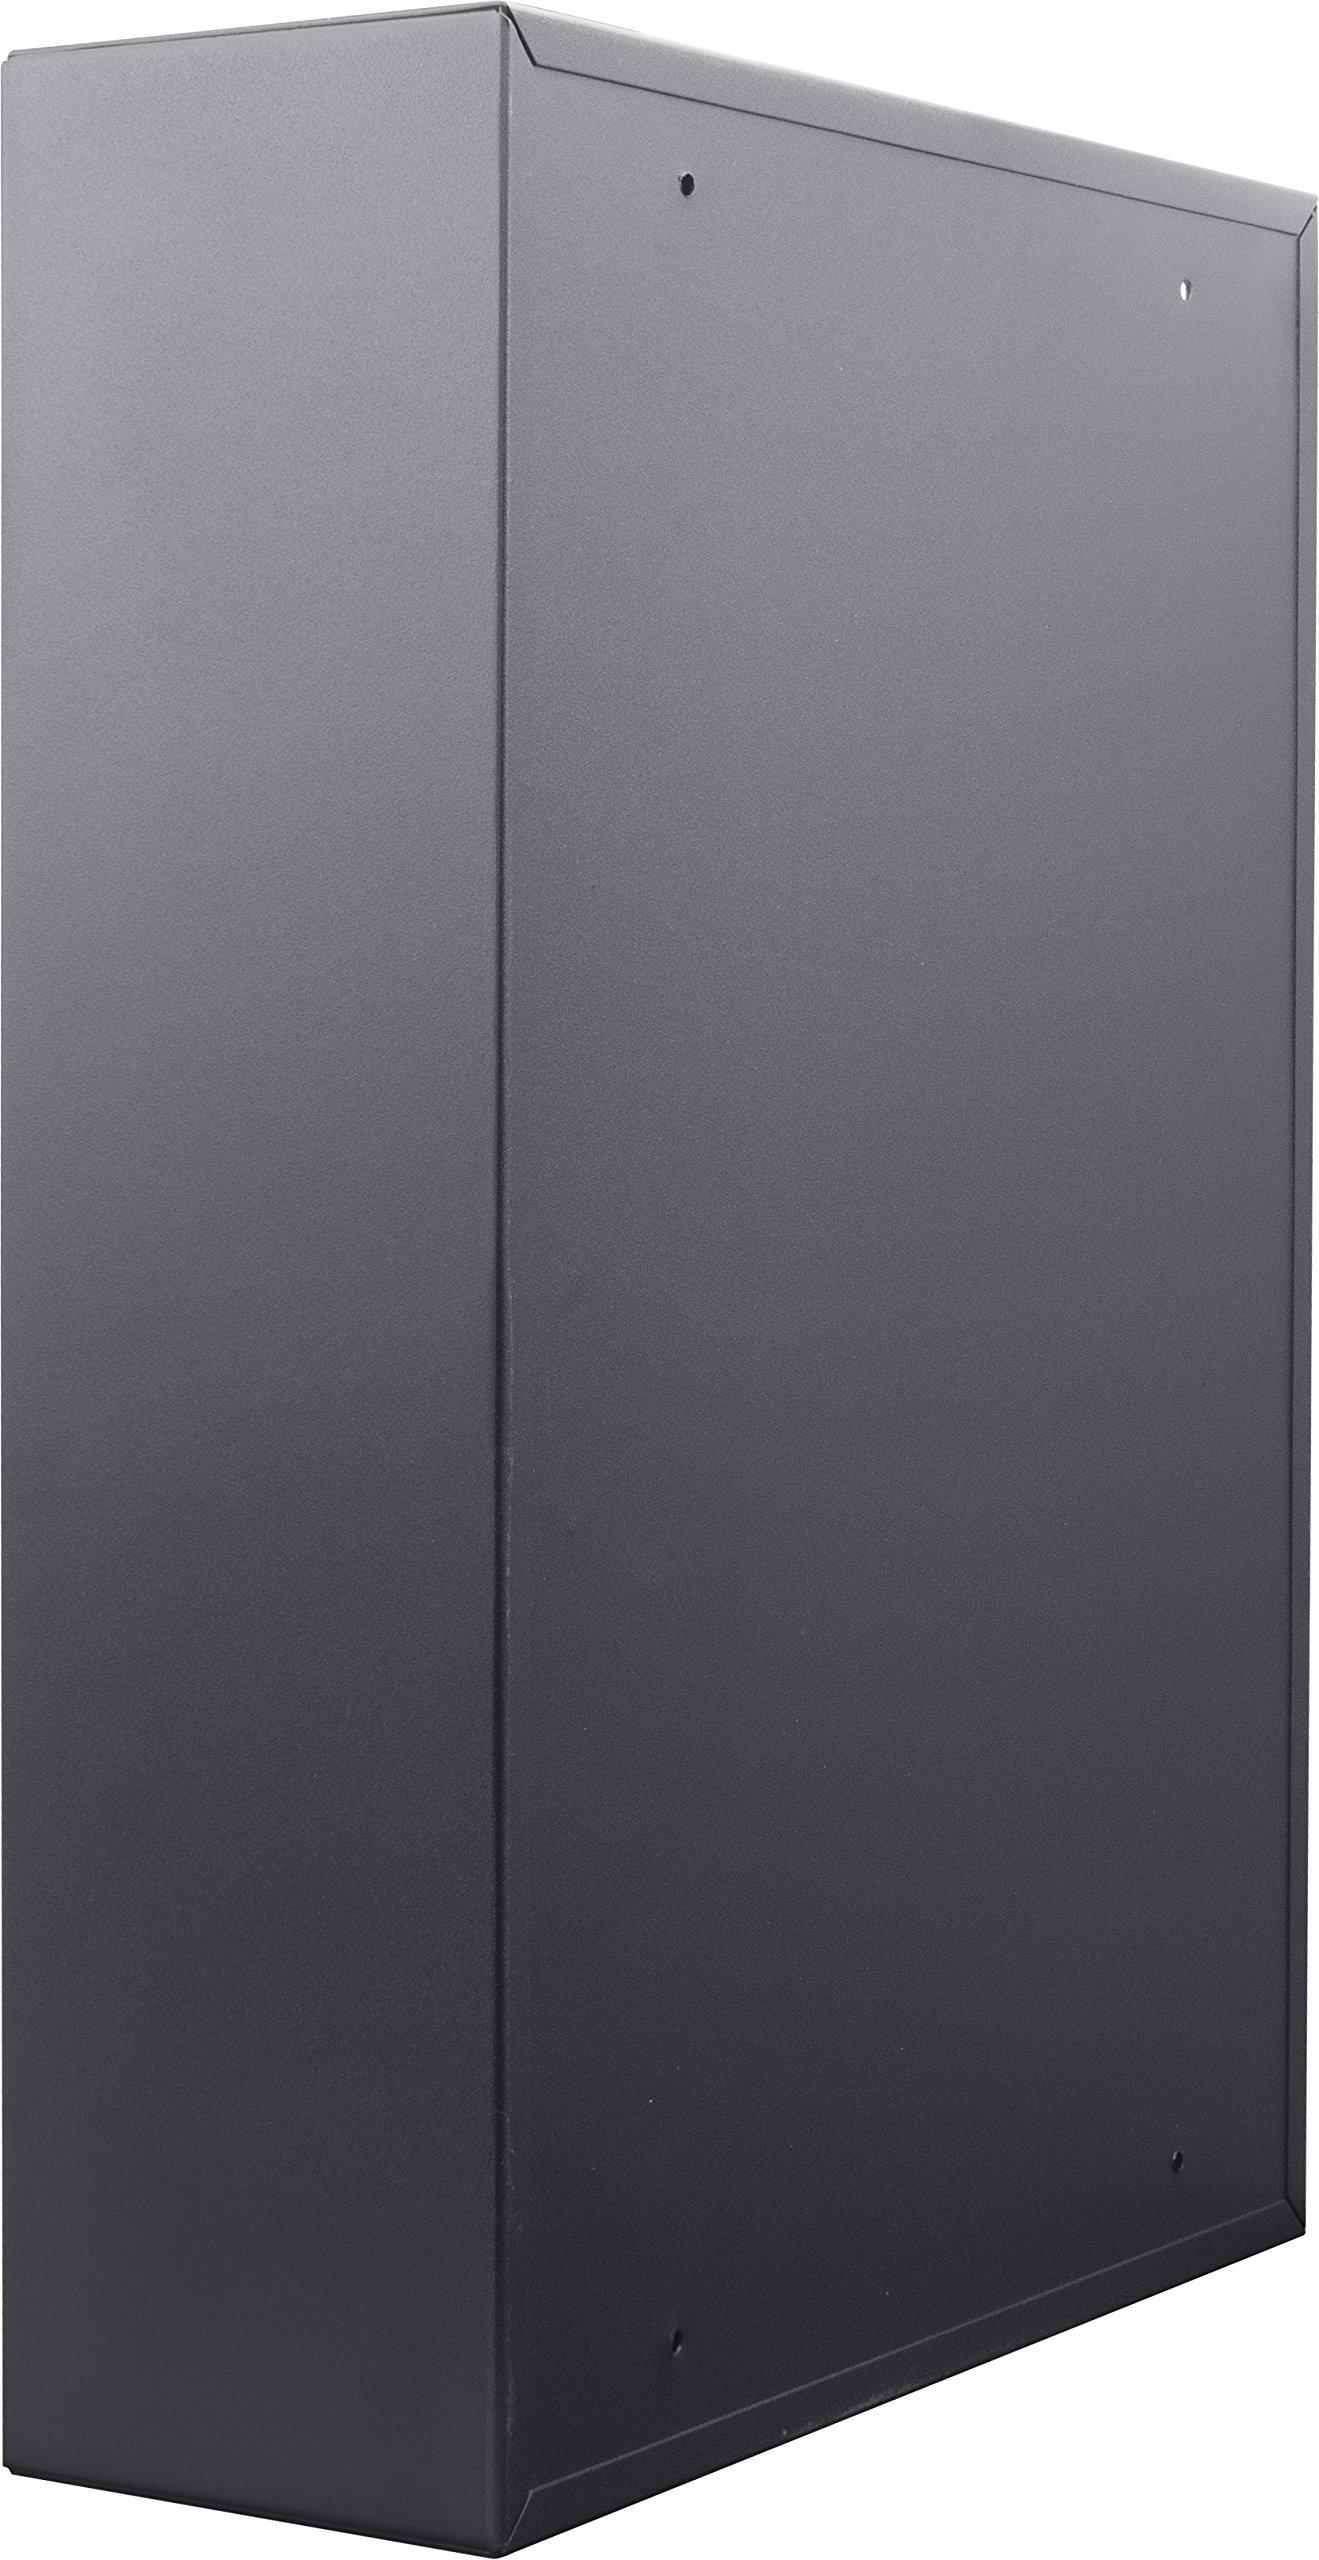 BARSKA CB13266 200 Position Key Cabinet with Combo Lock by BARSKA (Image #4)